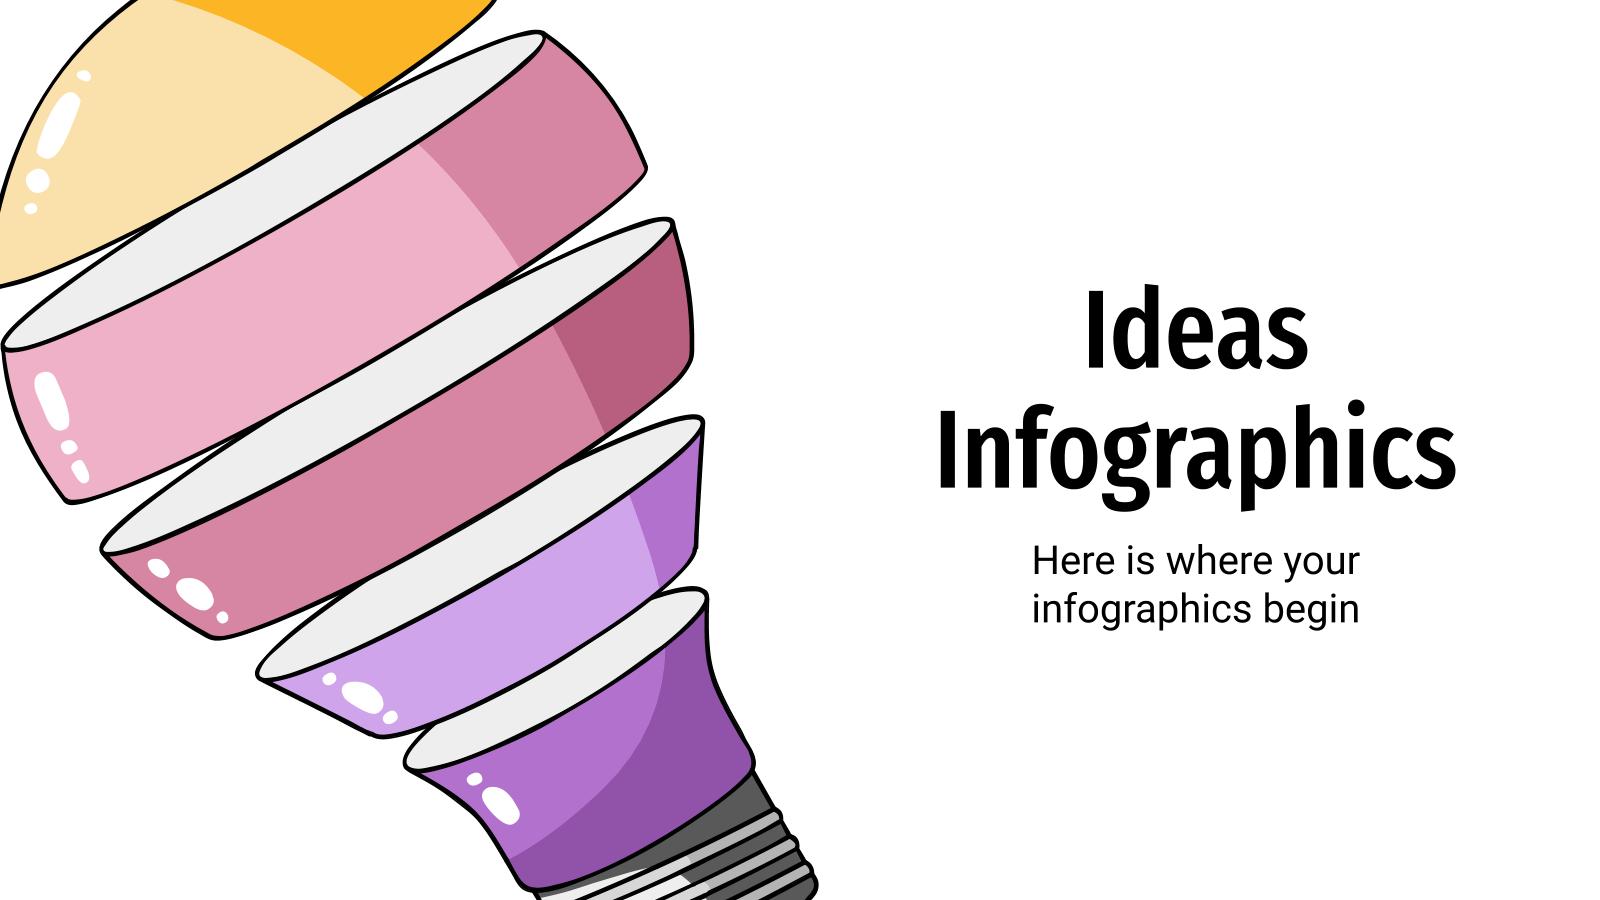 Plantilla de presentación Infografías de ideas